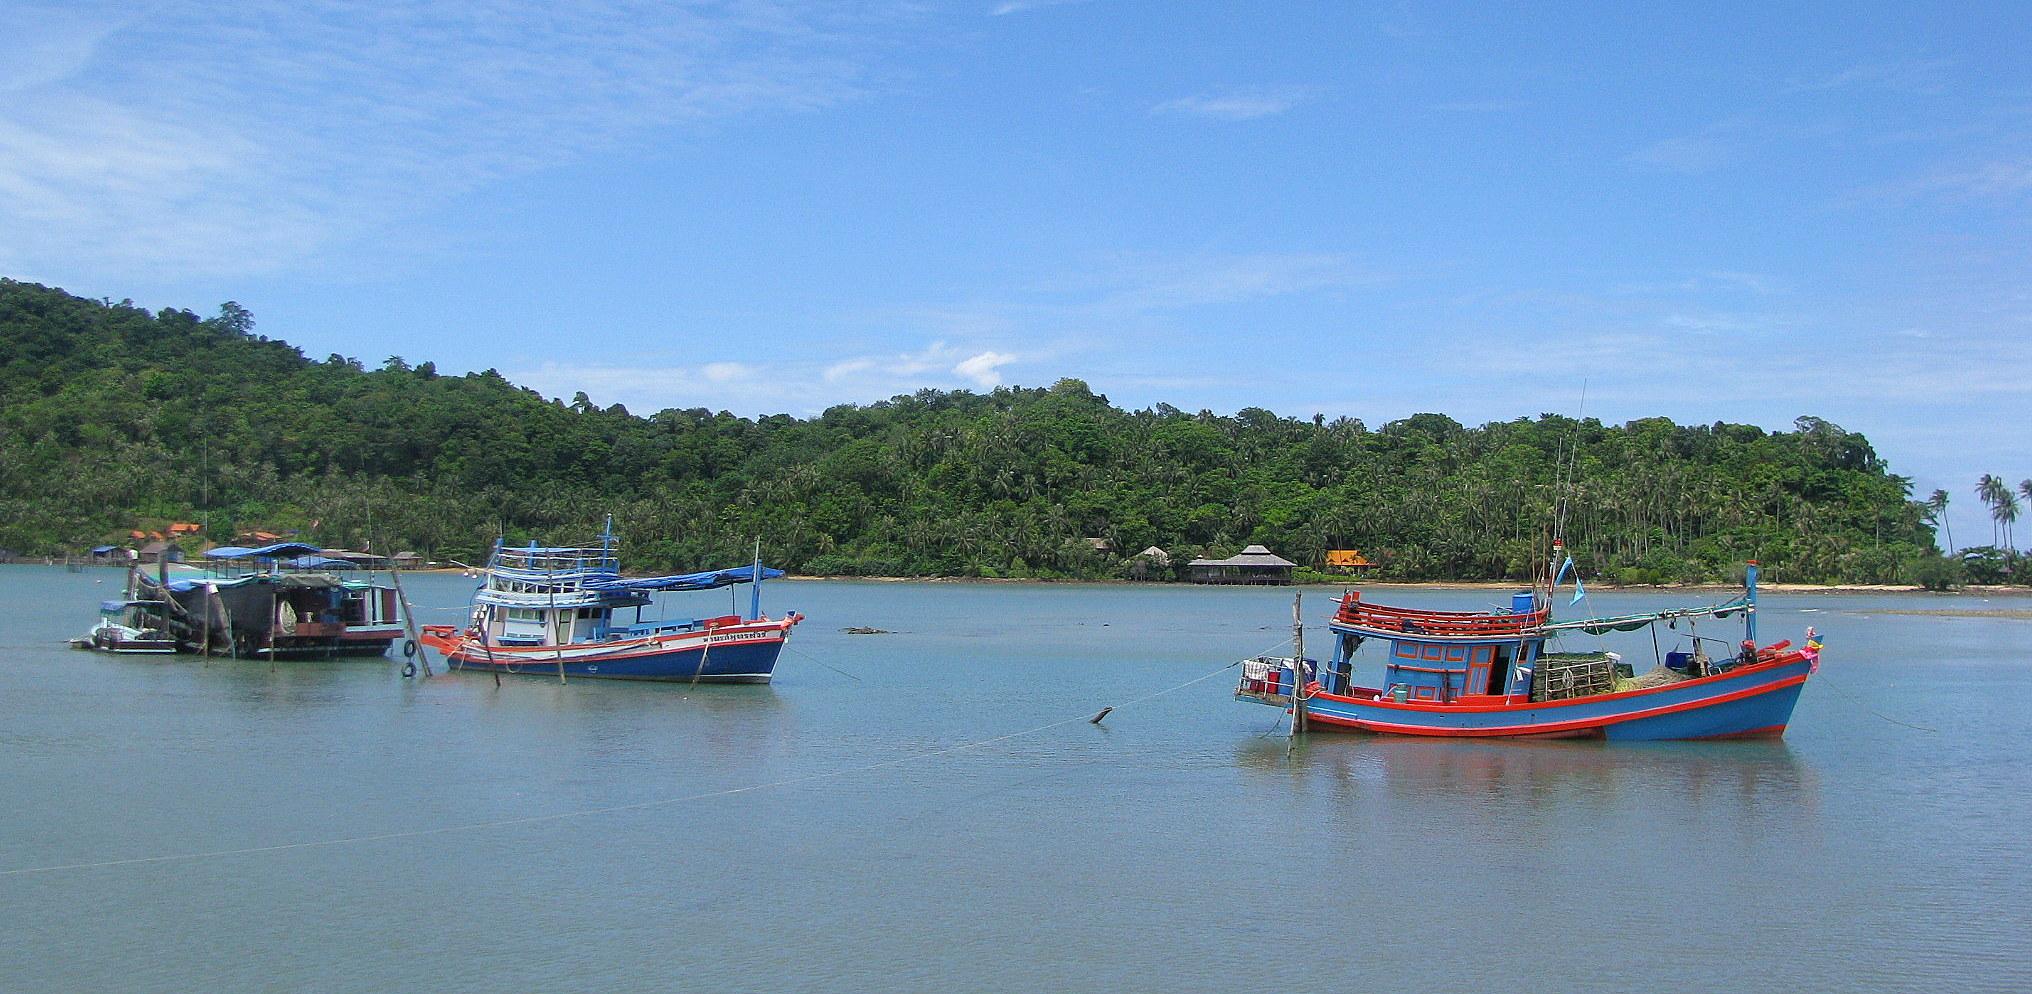 Boats in Bangbao, Africa, Bangbao, Boats, Fisherman, HQ Photo